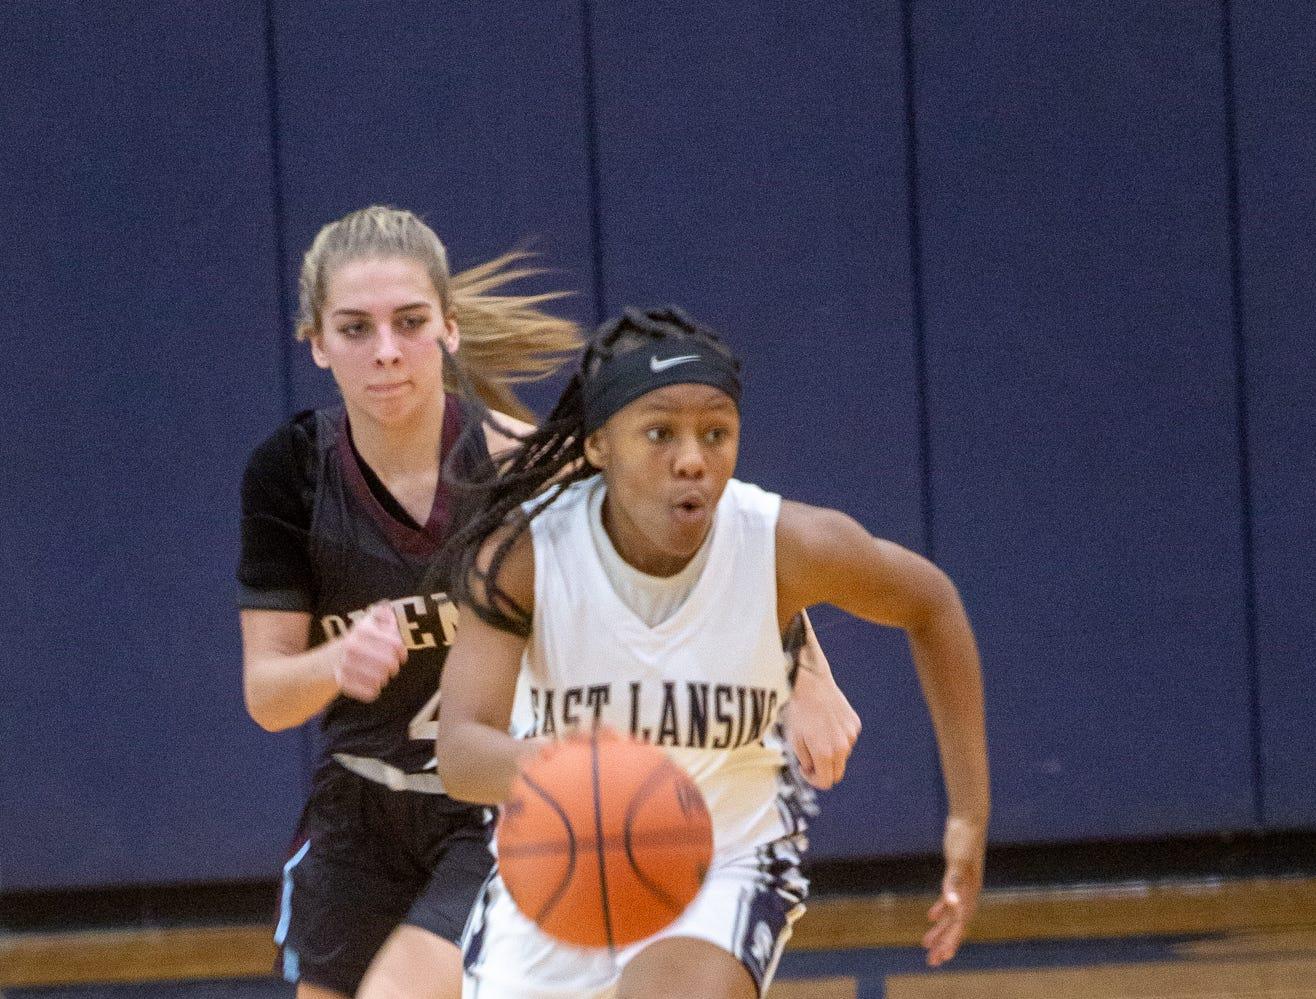 East Lansing junior, Paris Hayes brings ball down the court Tuesday, Jan. 8, 2019, at East Lansing High School.